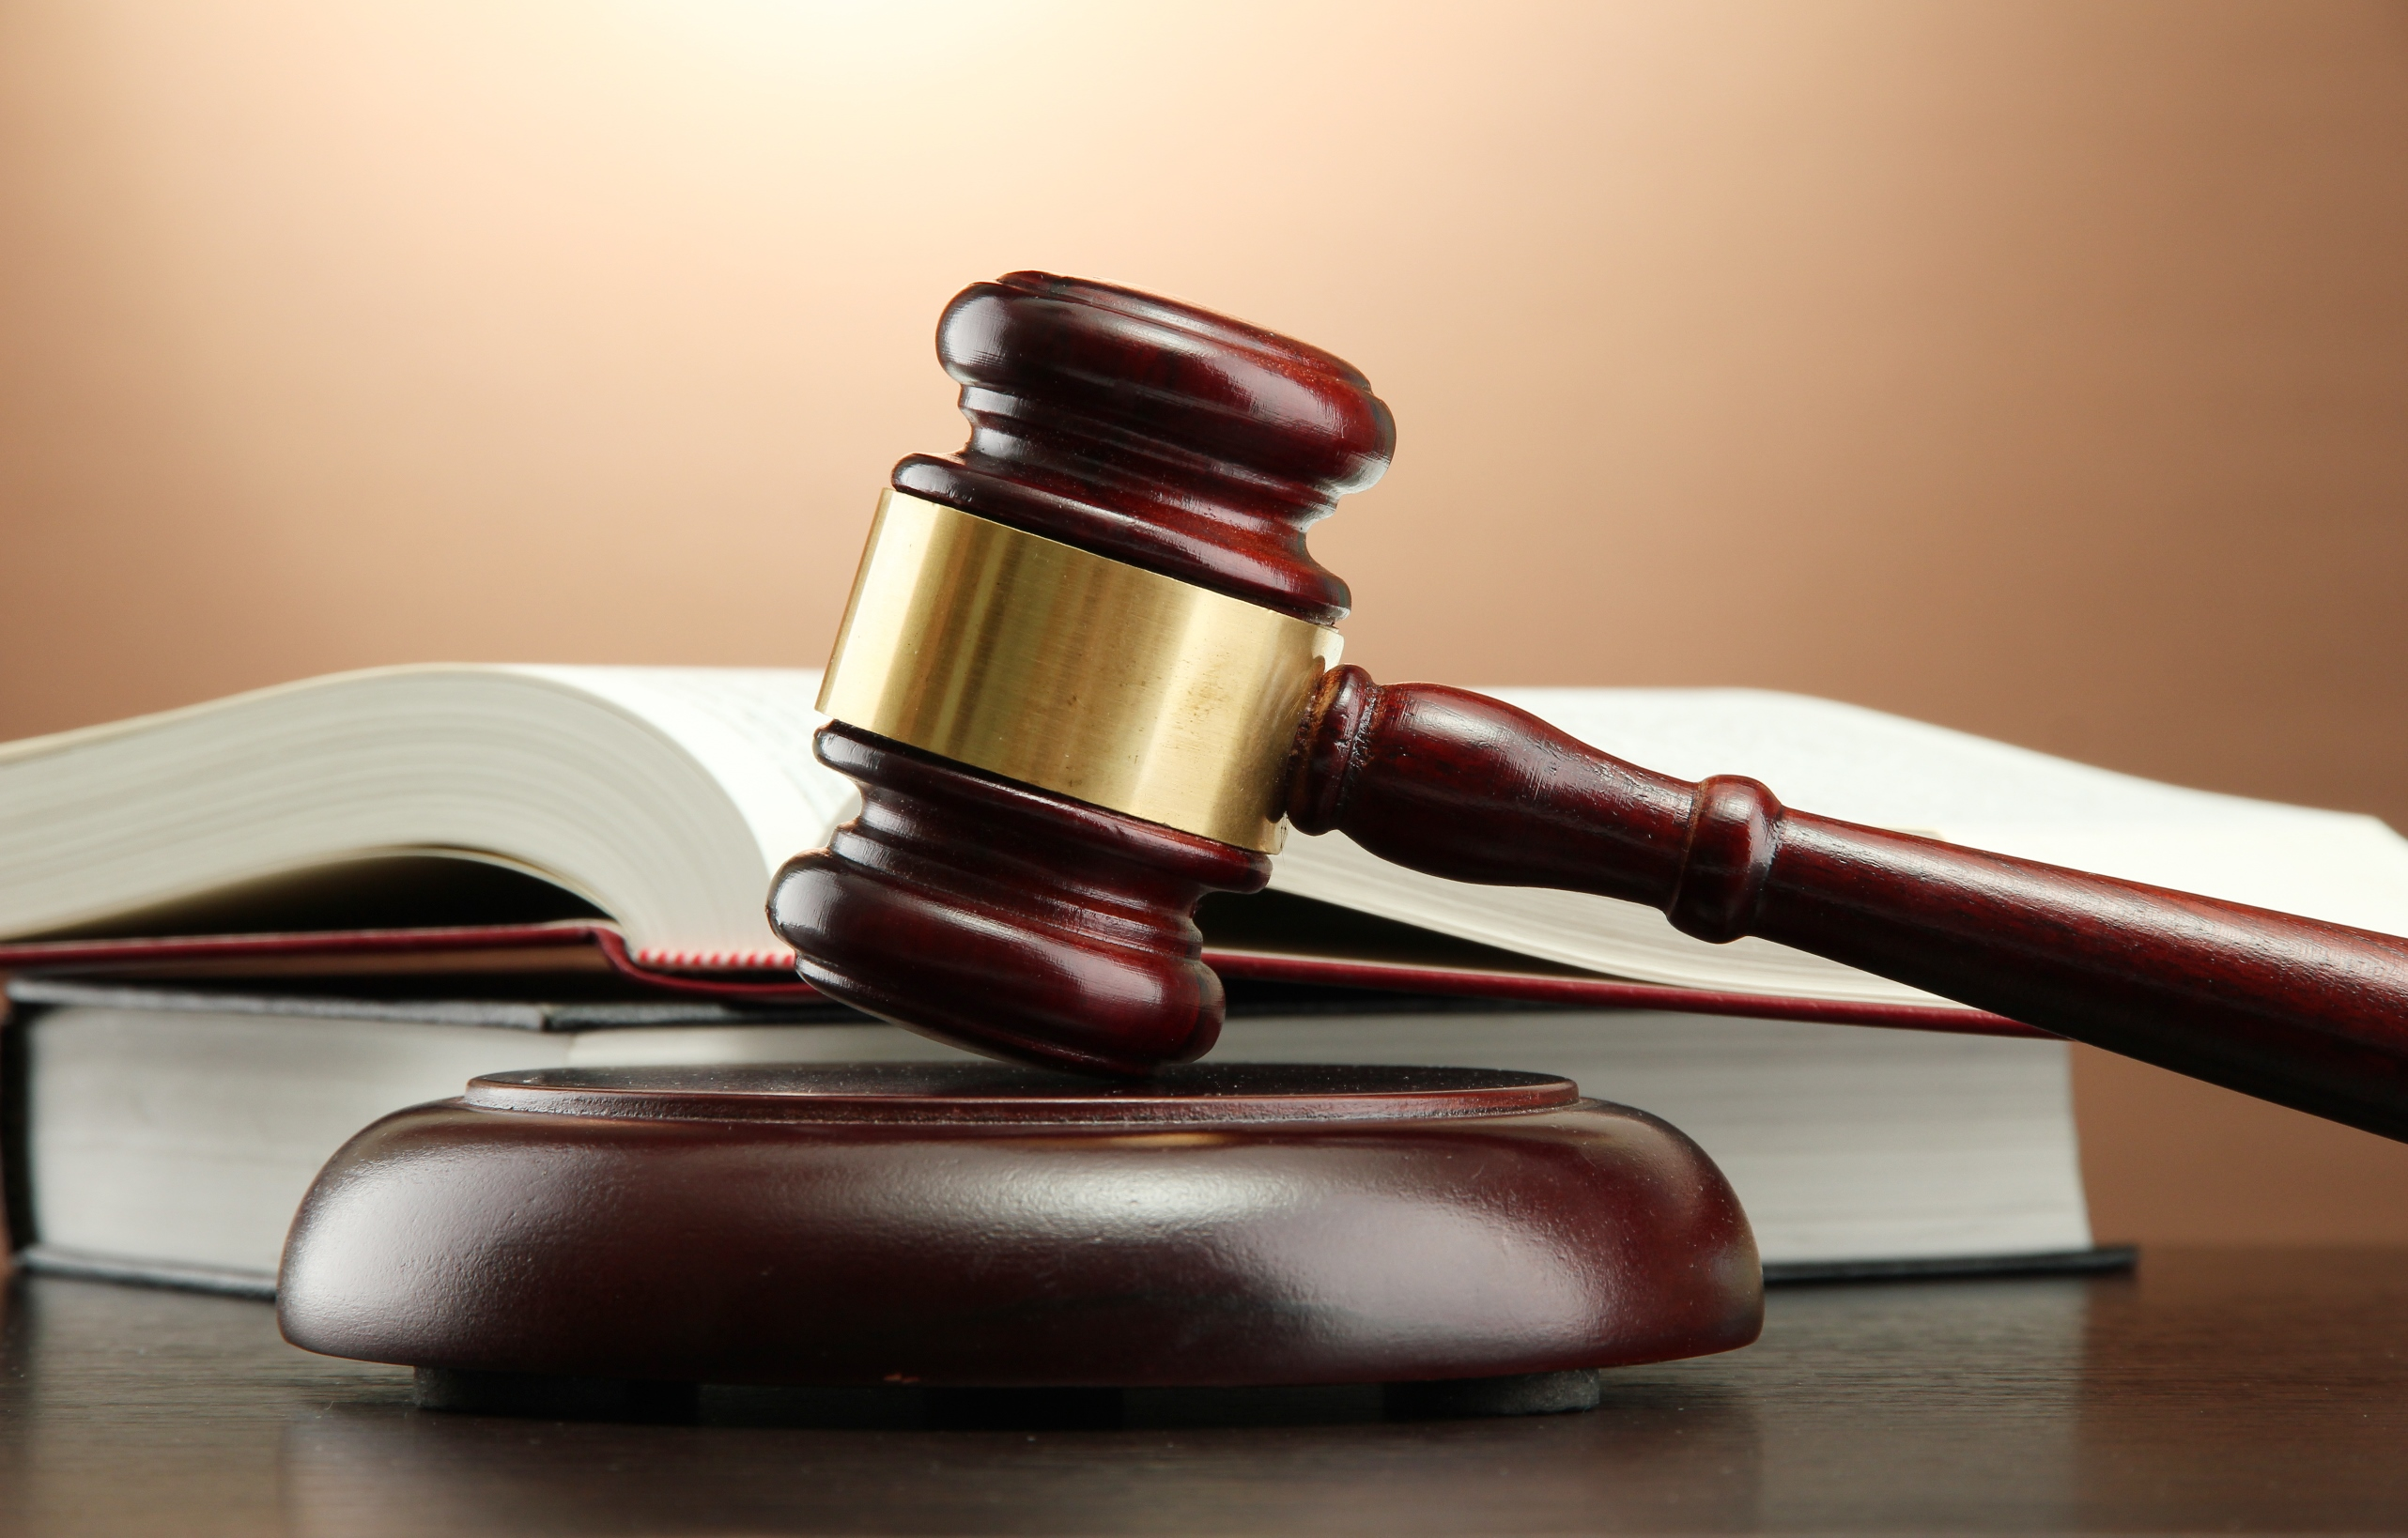 Judes-Ronald Fontaine plaide coupable